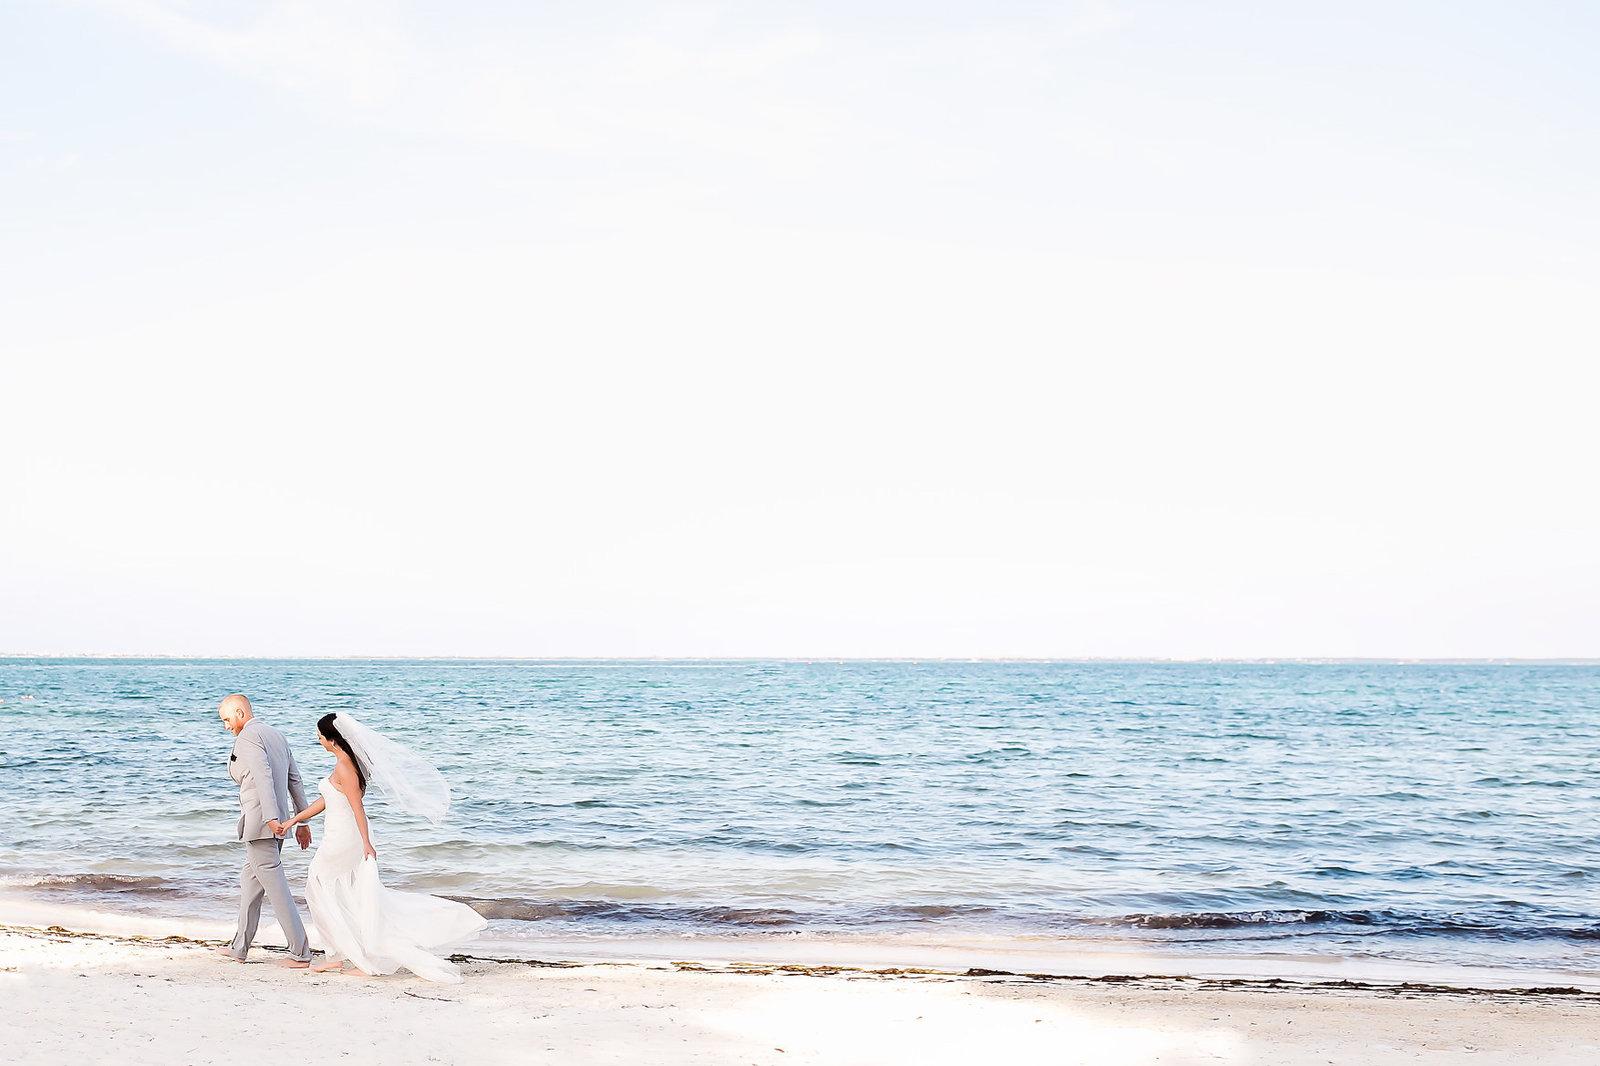 kim-justin-wedding-chrisloringphotography-3101-Edit-Edit copyiii